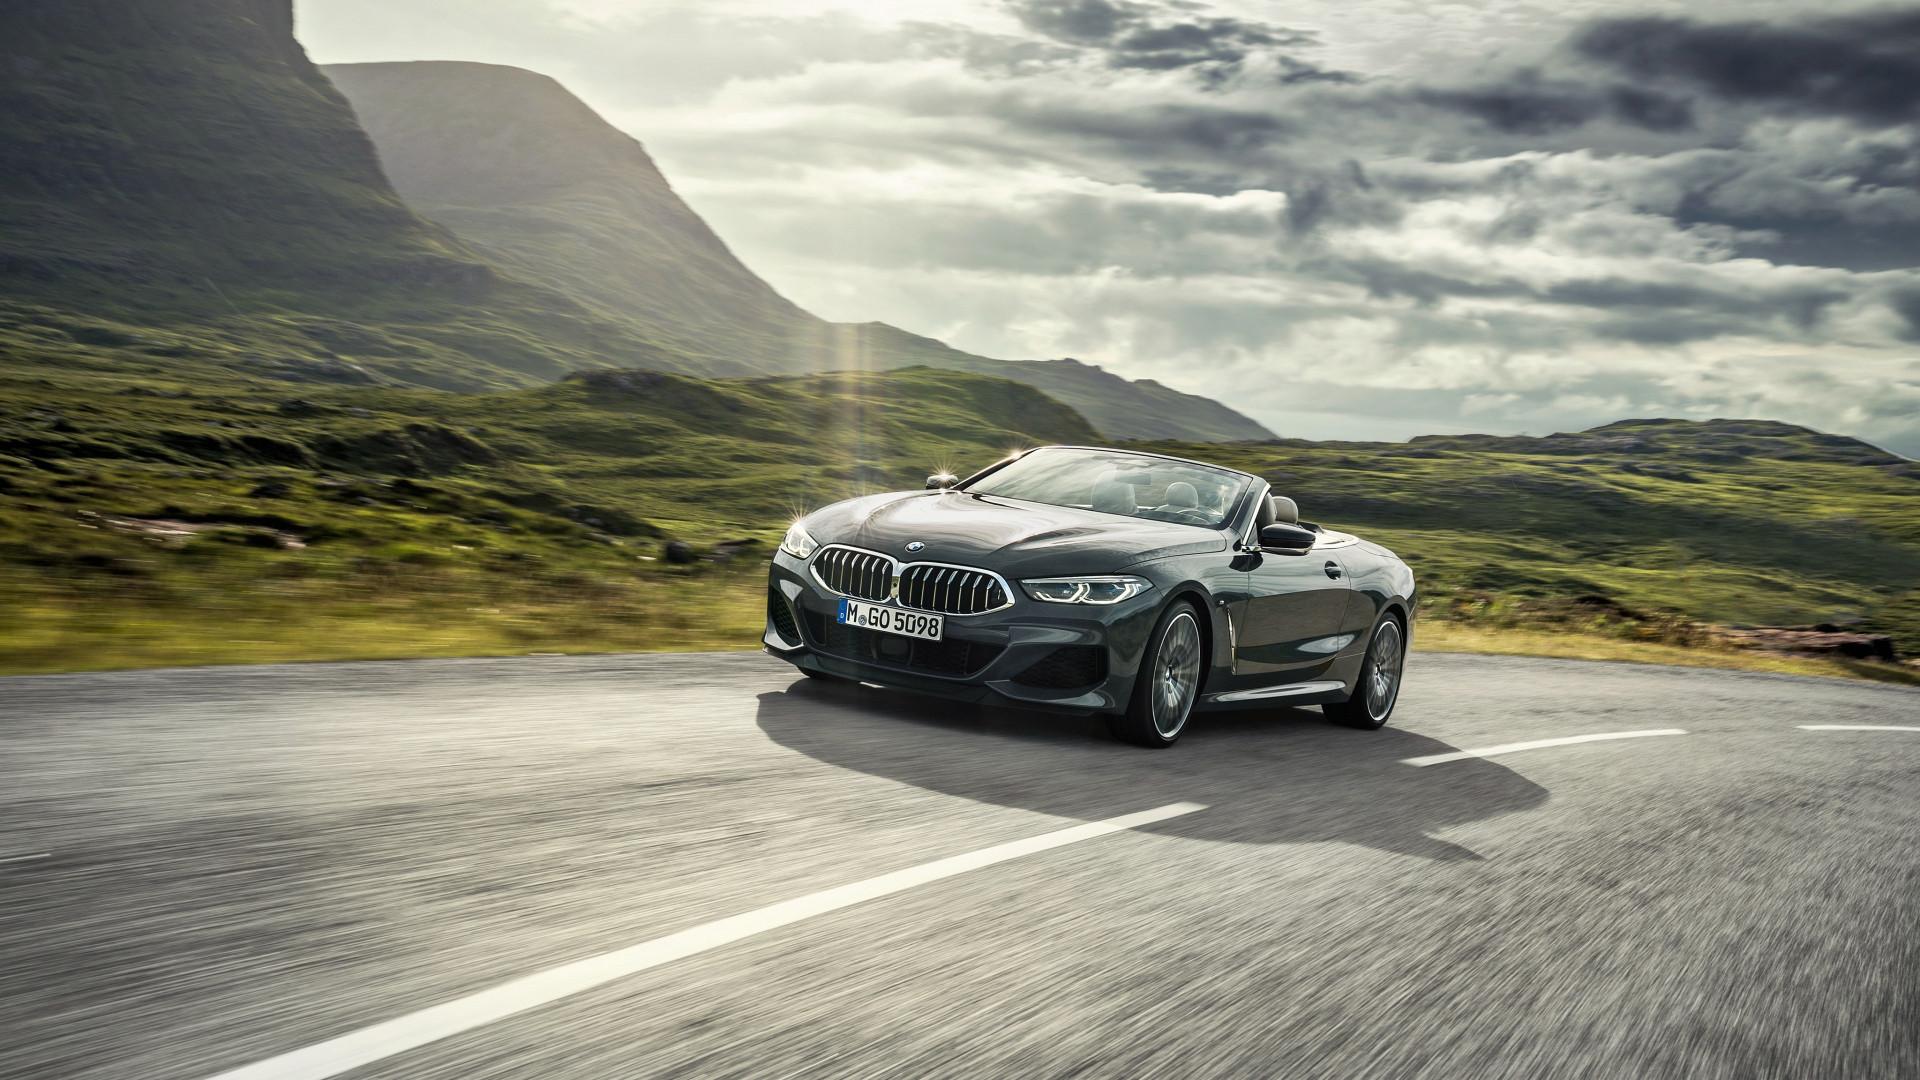 Download wallpaper: BMW 8 Series Convertible 1920x1080